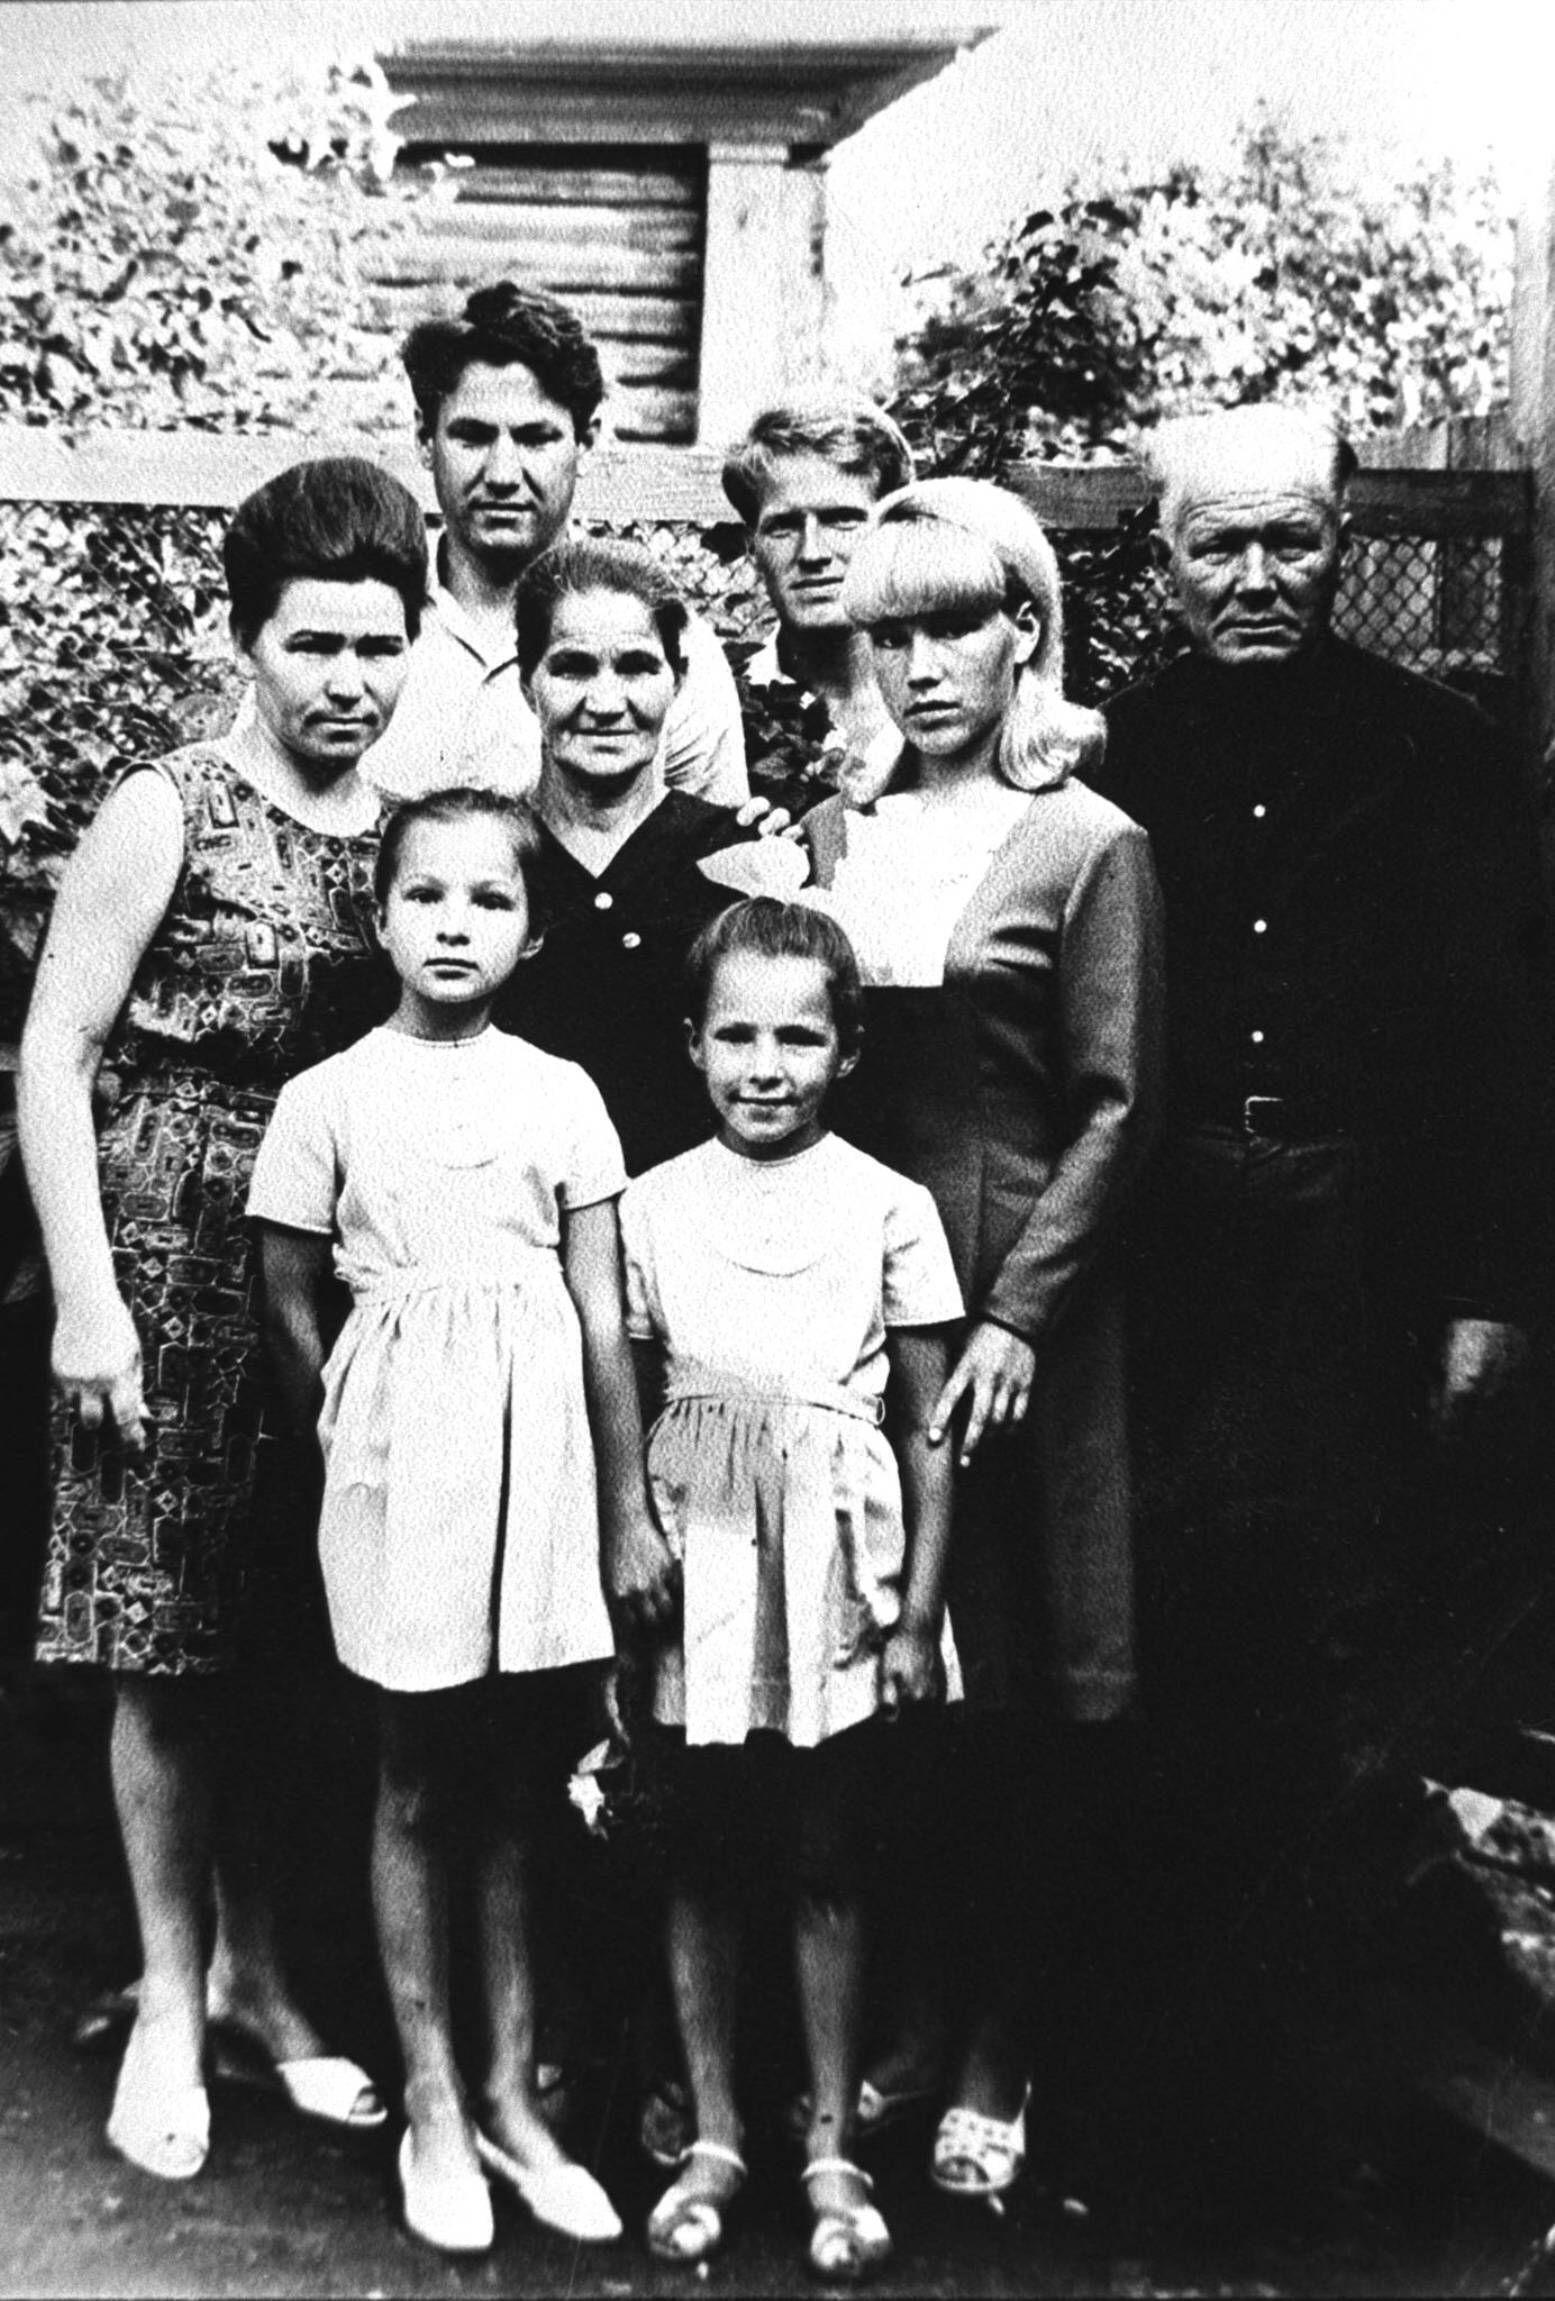 1956 photo from the Photo Biography of Boris Yeltsin. Pictured L-R are Boris Yeltsin s spouse Naina, daughter Elena, Bo